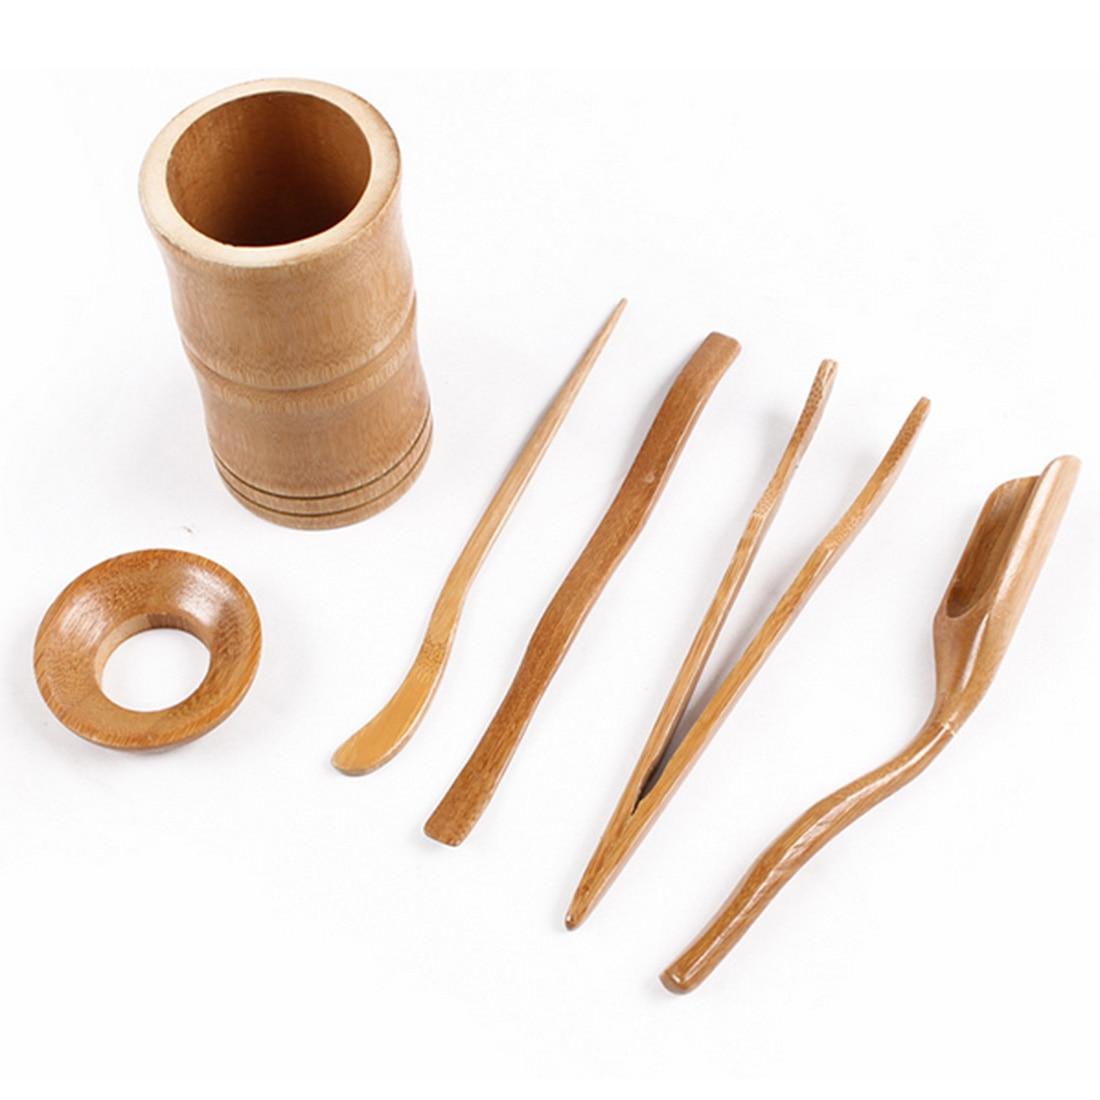 6Pcs/Set Home Tea High Quality Chinese Kongfu Tea Ceremony Utensils Set Bamboo Tea Accessories